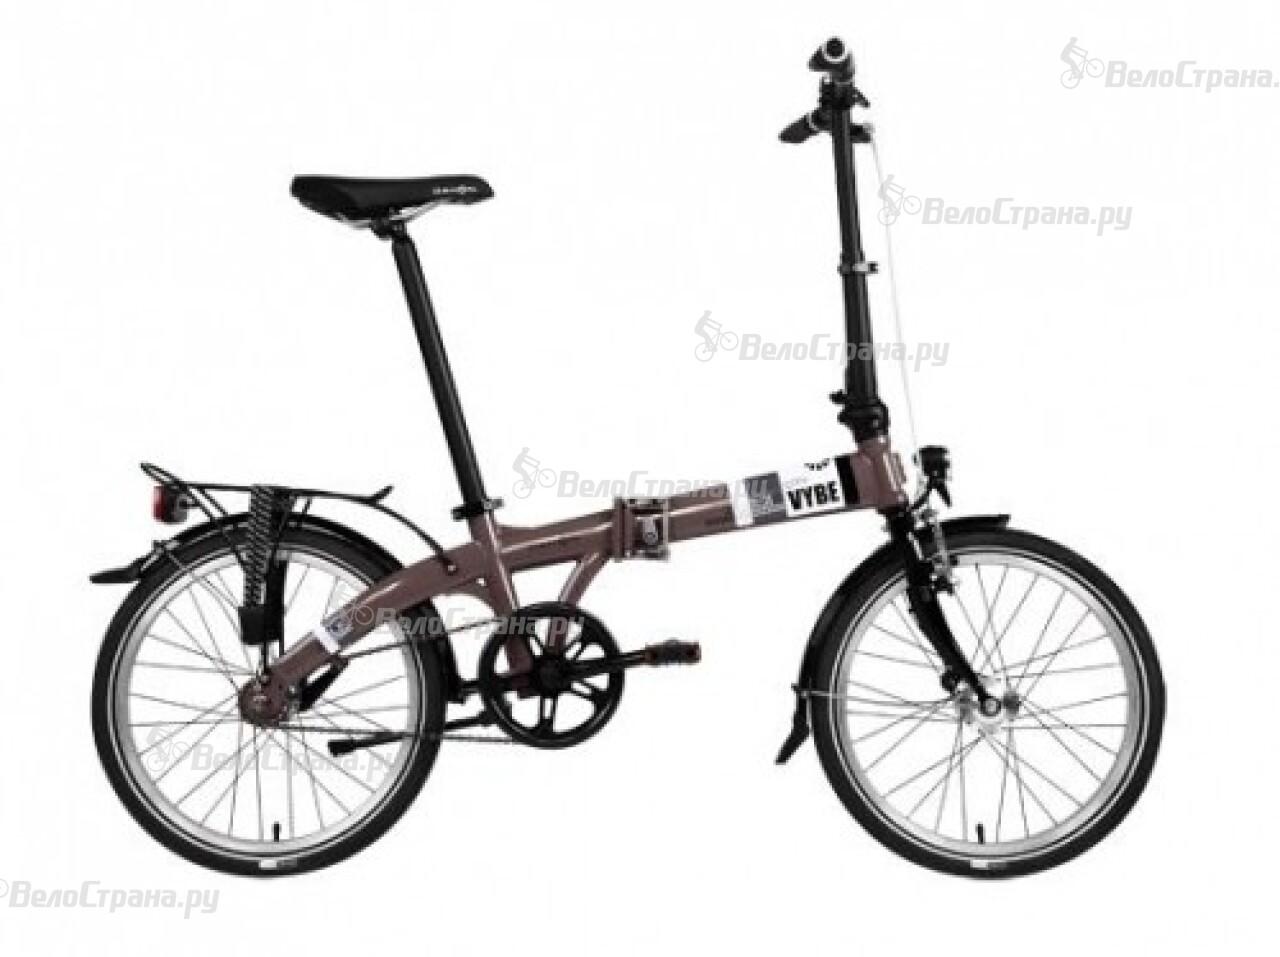 Велосипед Dahon Vybe D2 (2014) велосипед dahon vybe d7 u 2017